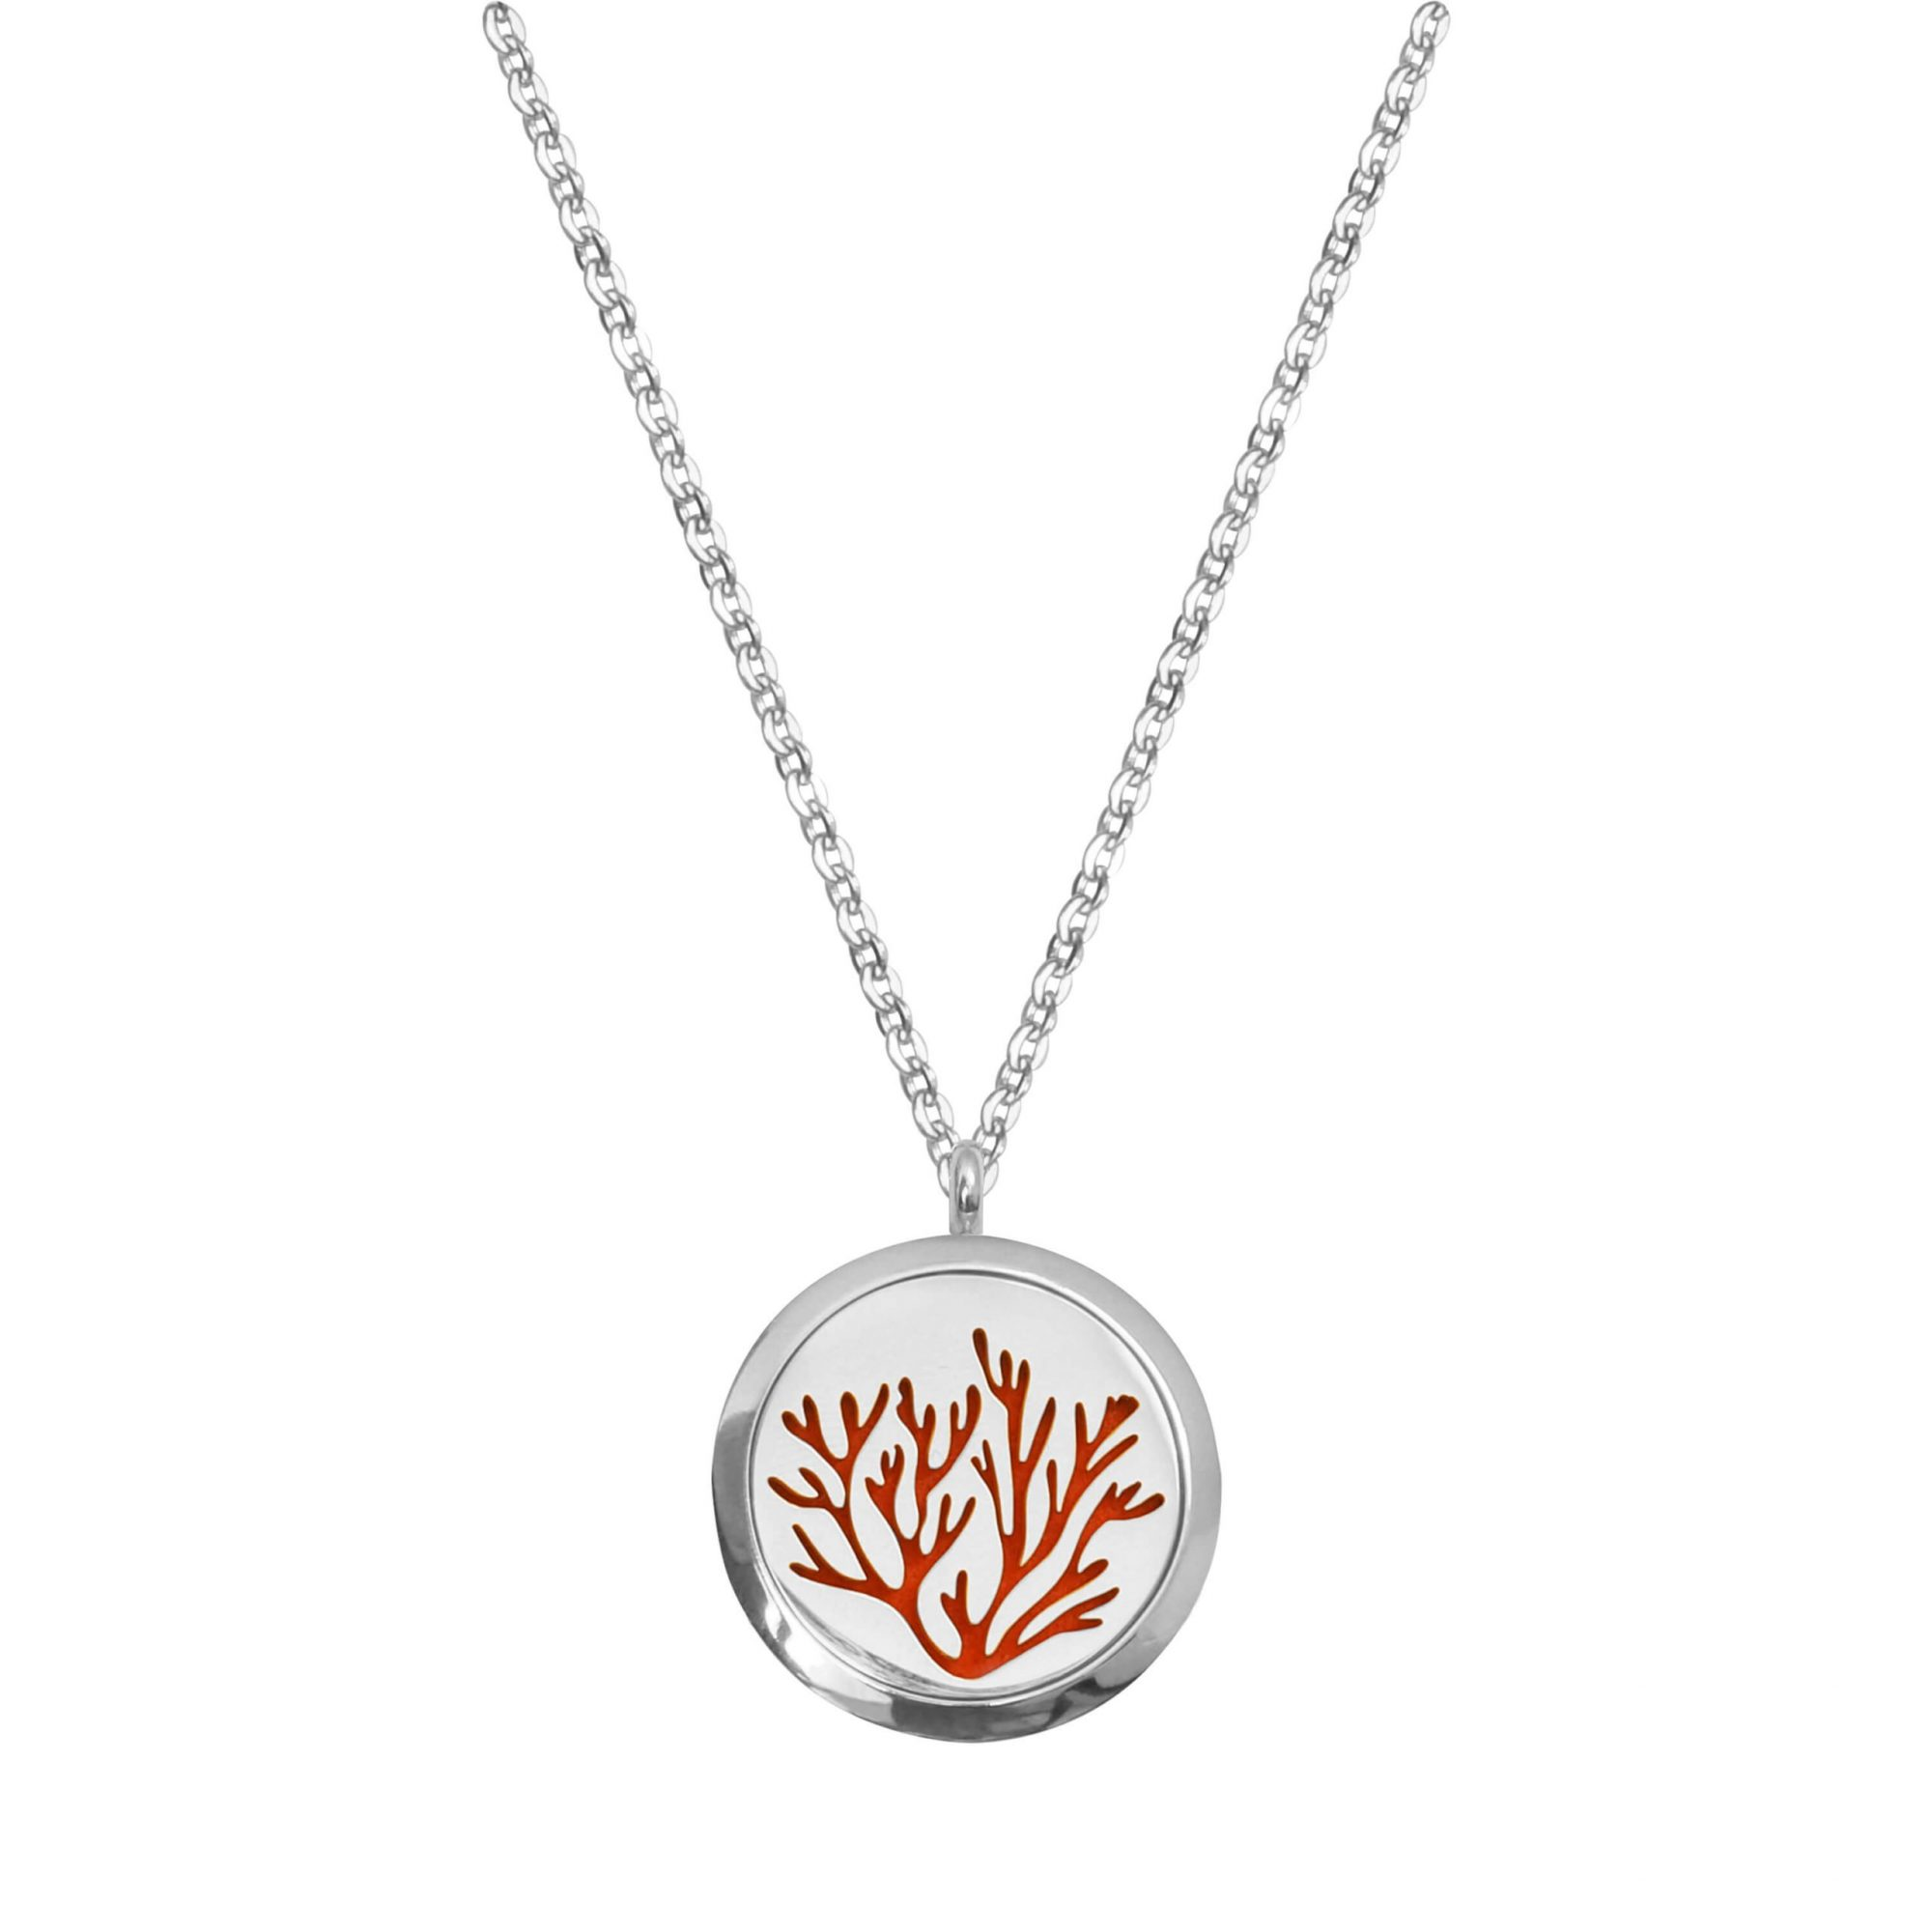 Lucky charm jewellery